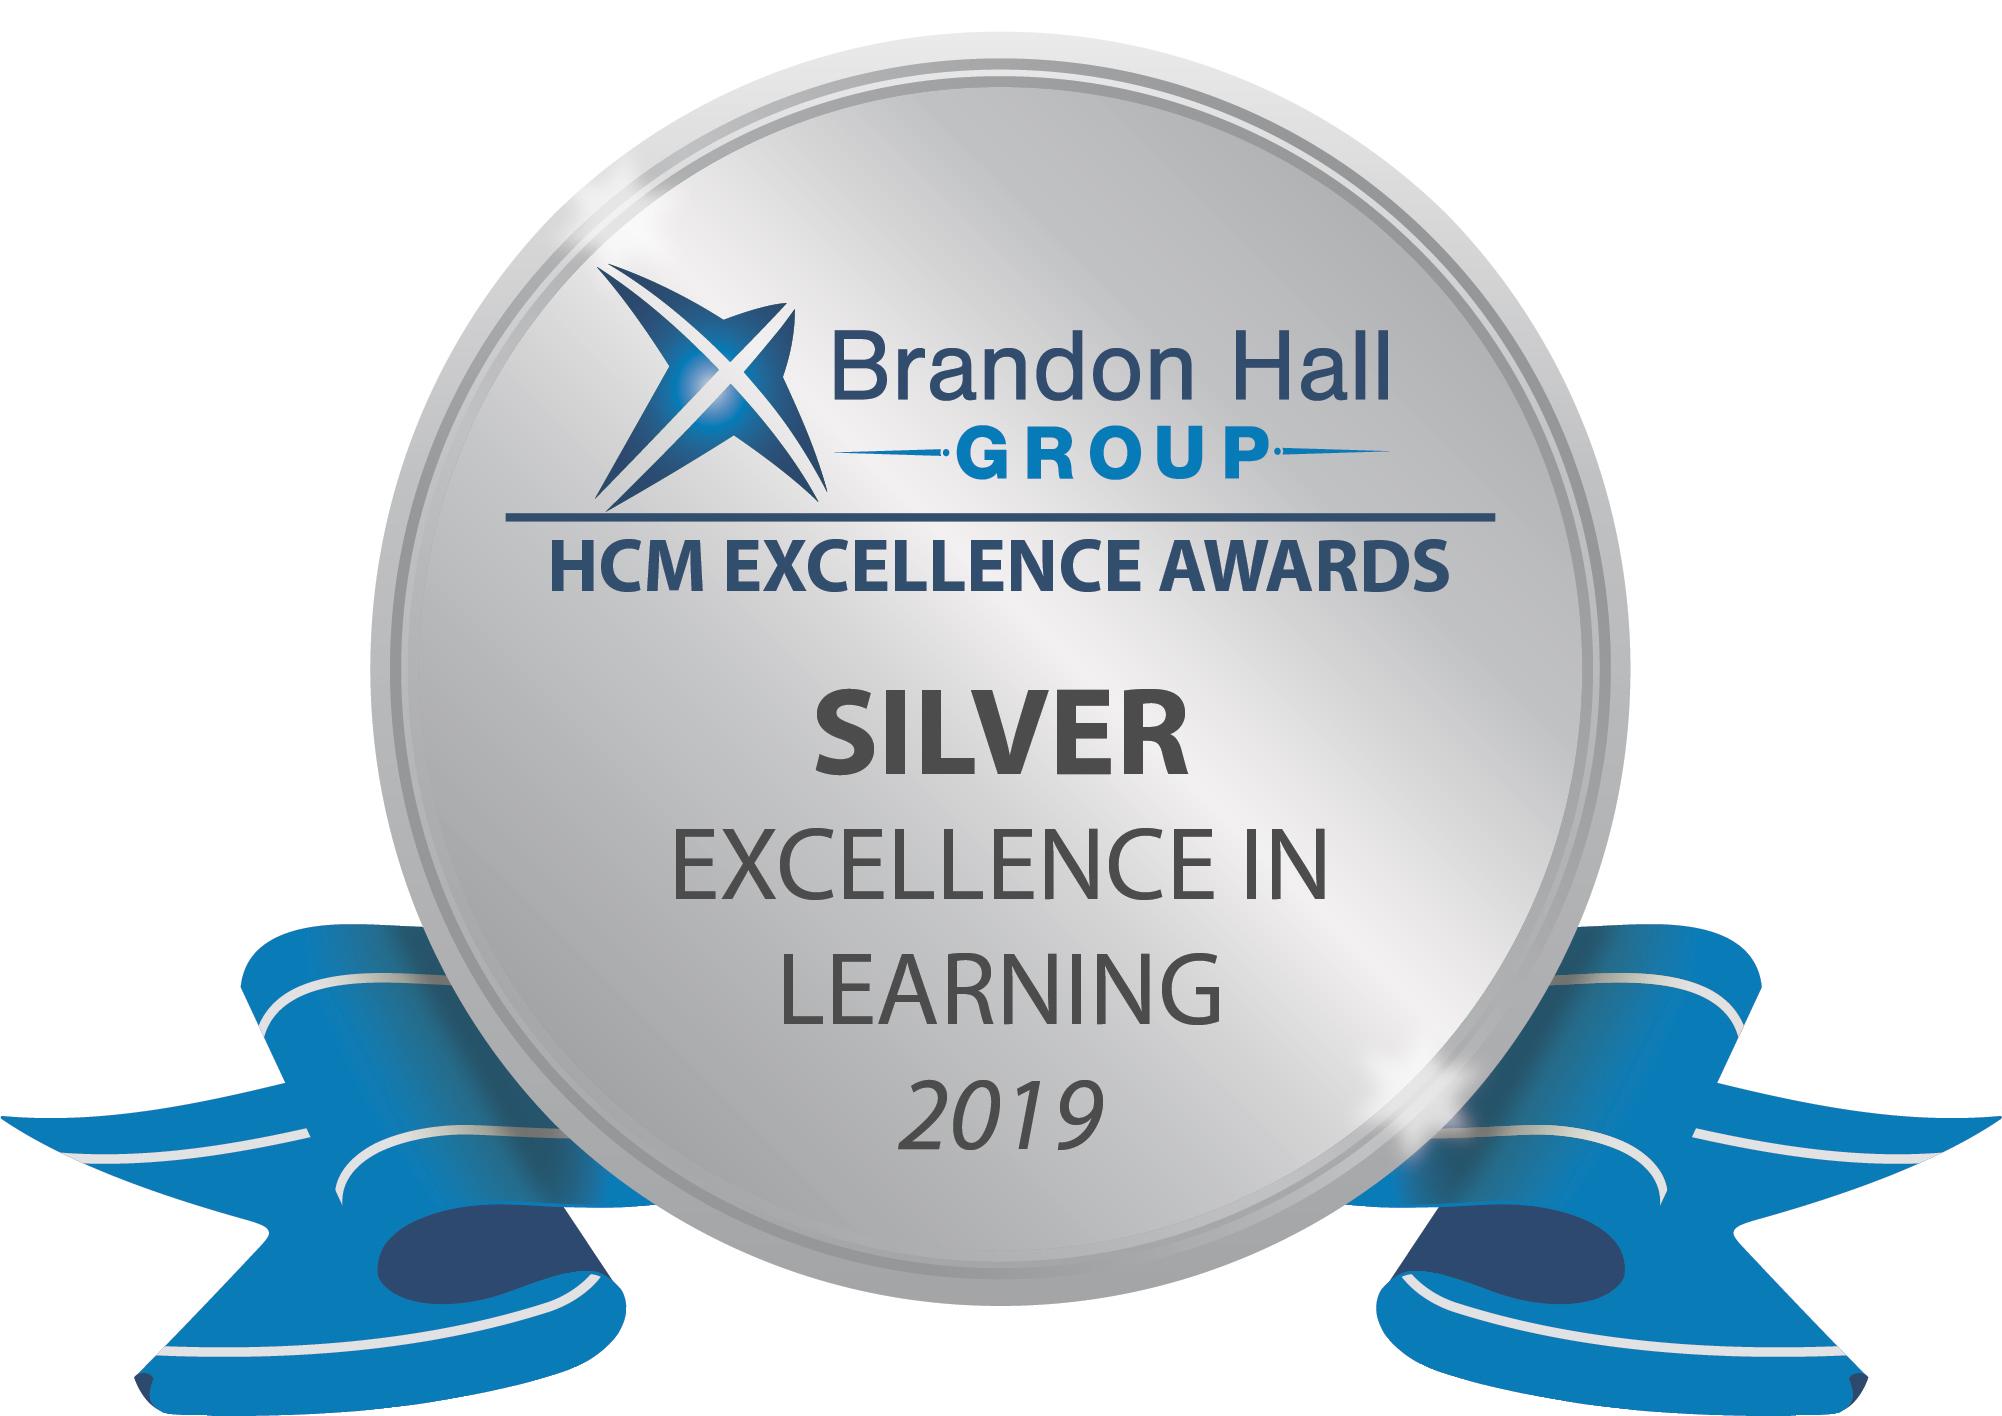 Learning Silver Brandon Hall